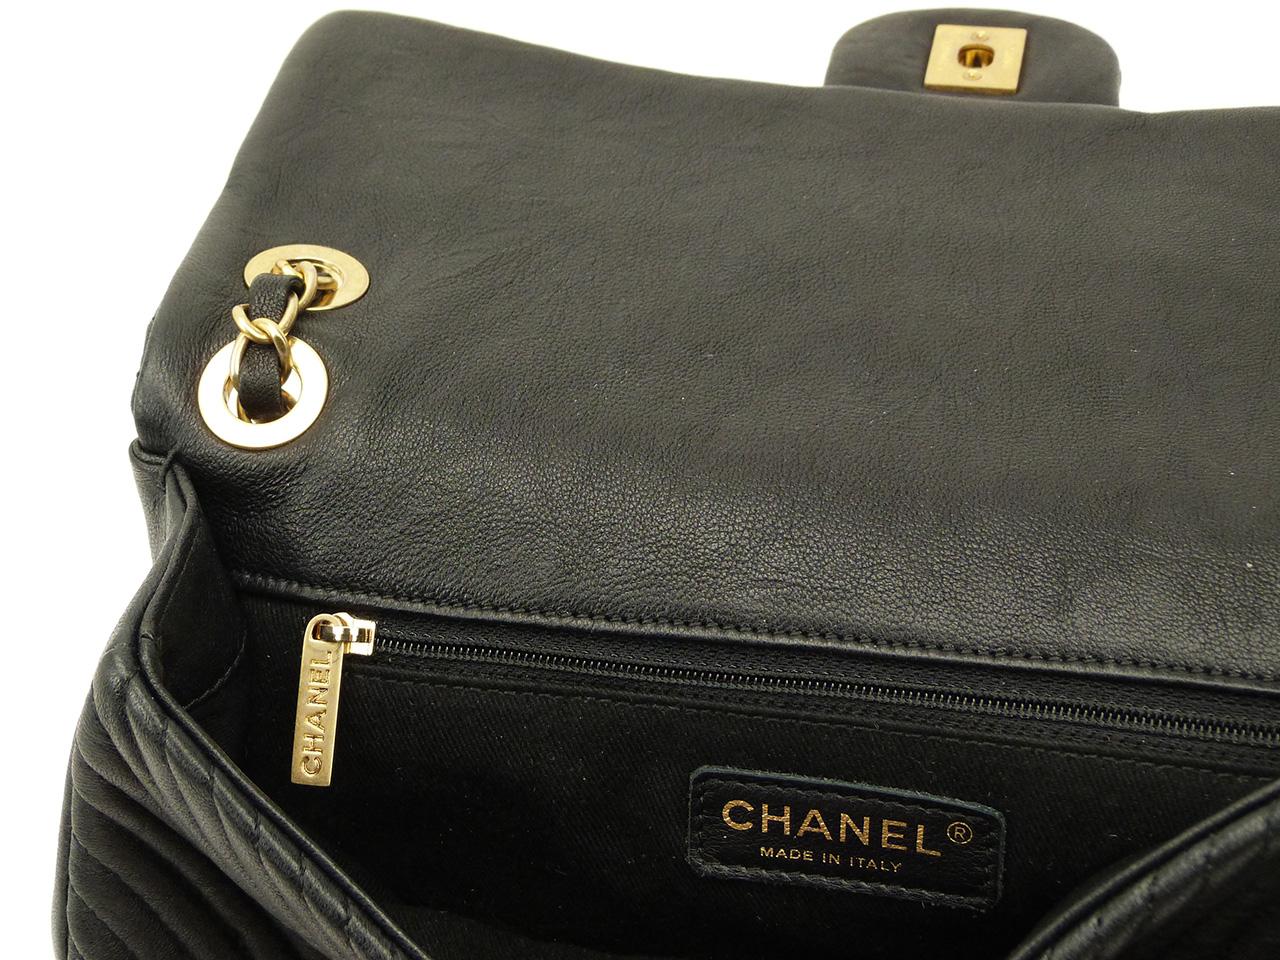 Sac à main Chanel Timeless Chevron medium Authentique d'occasion en cuir agneau